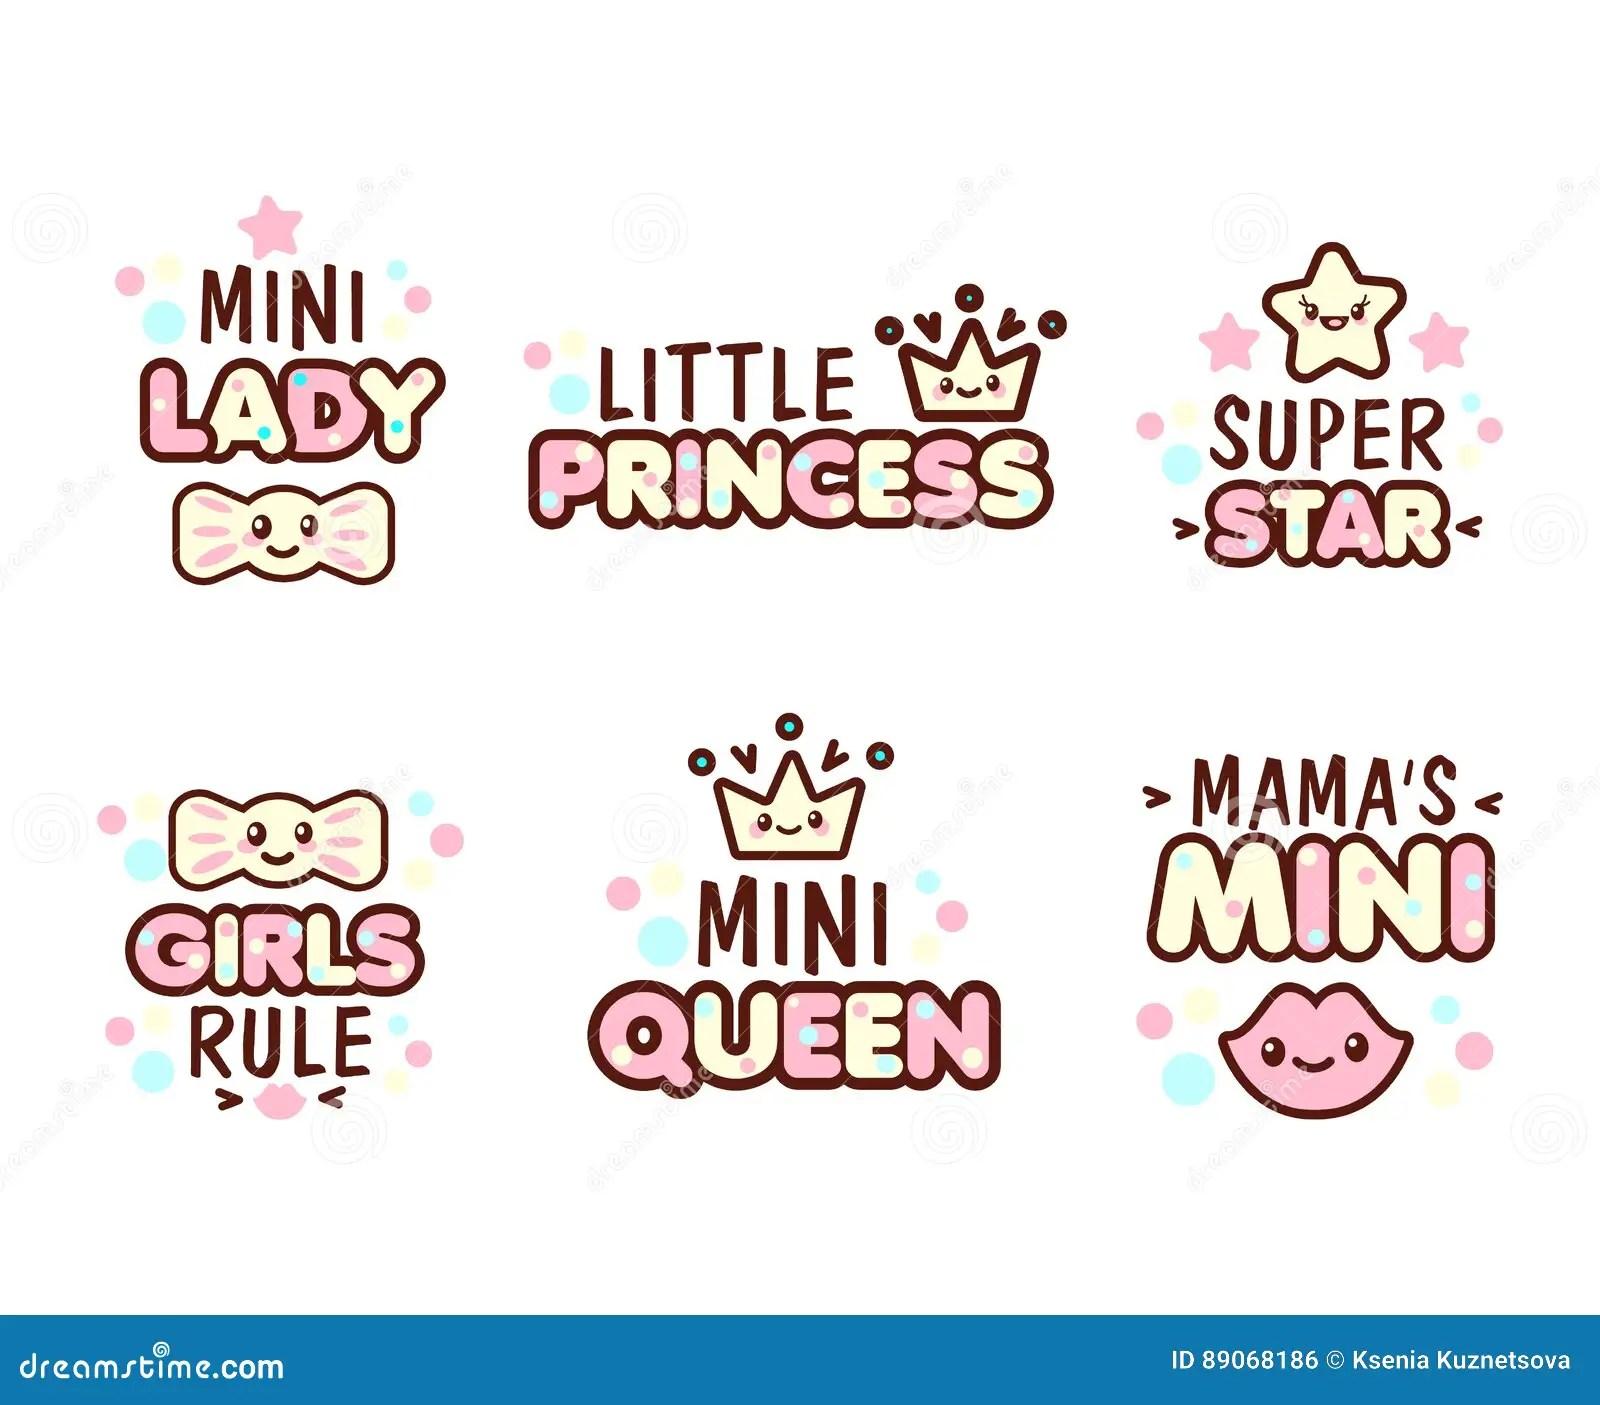 Star Wallpaper Cute Kawaii Cute Kawaii Emoticons With Baby Girl Objects Stock Vector